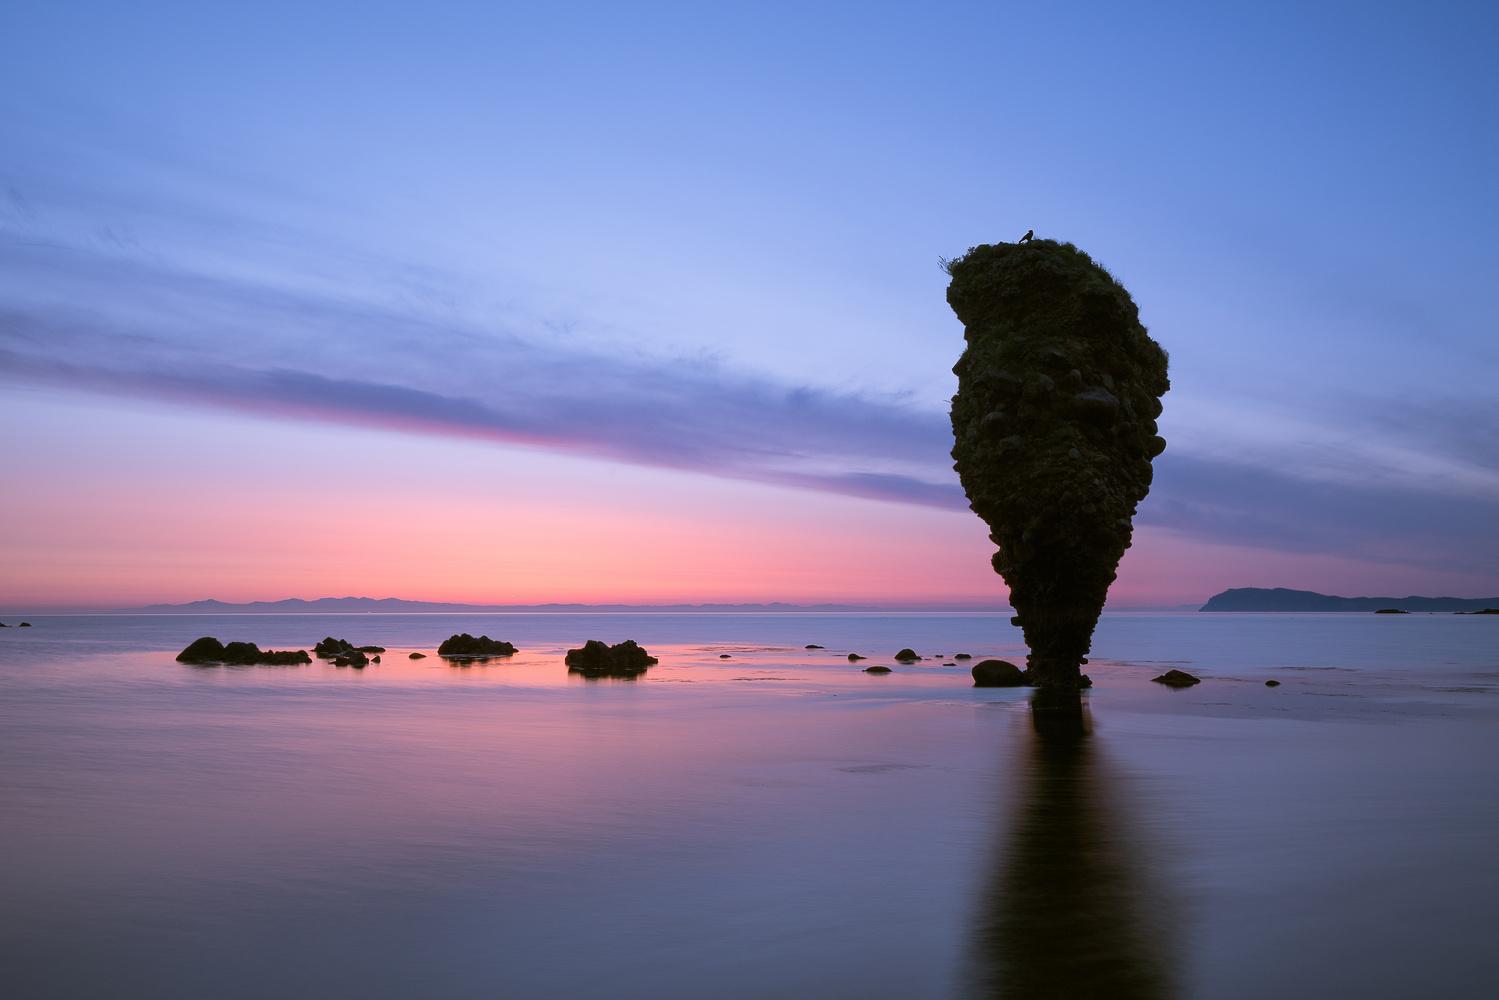 dawn by Hiroshi Tanita